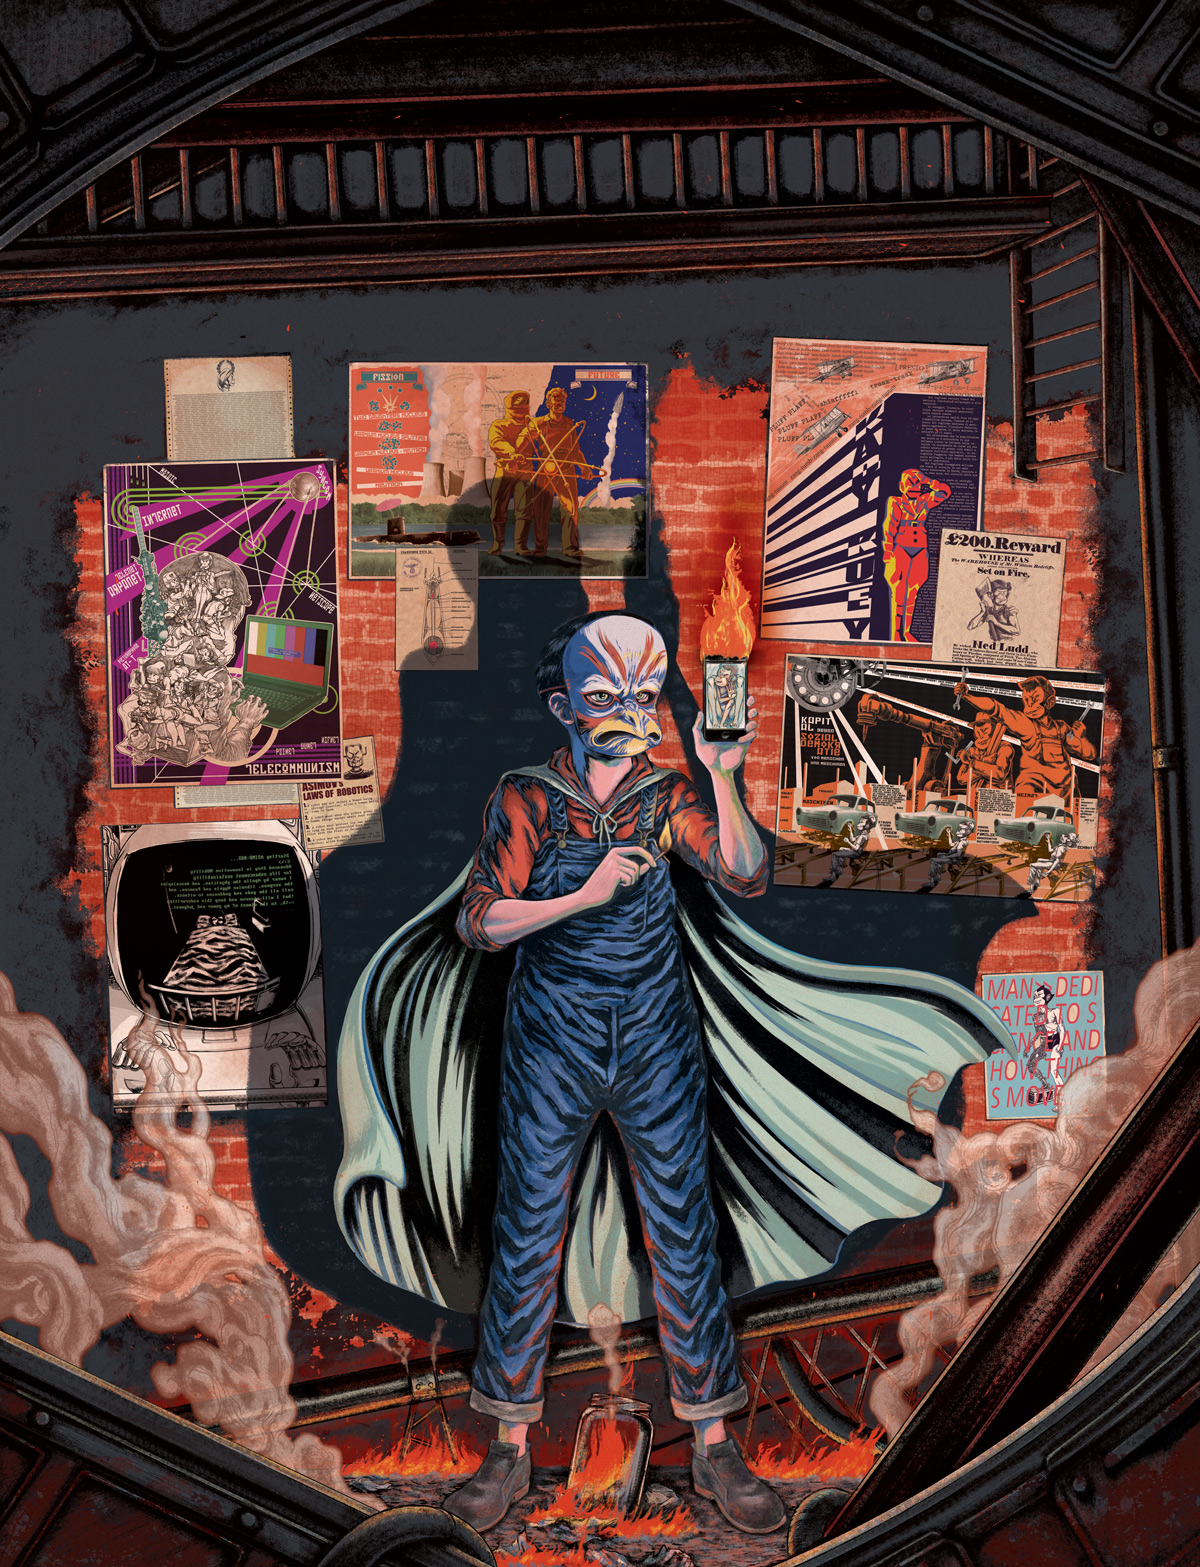 Digital Painting by Fabio Ramiro Rossin